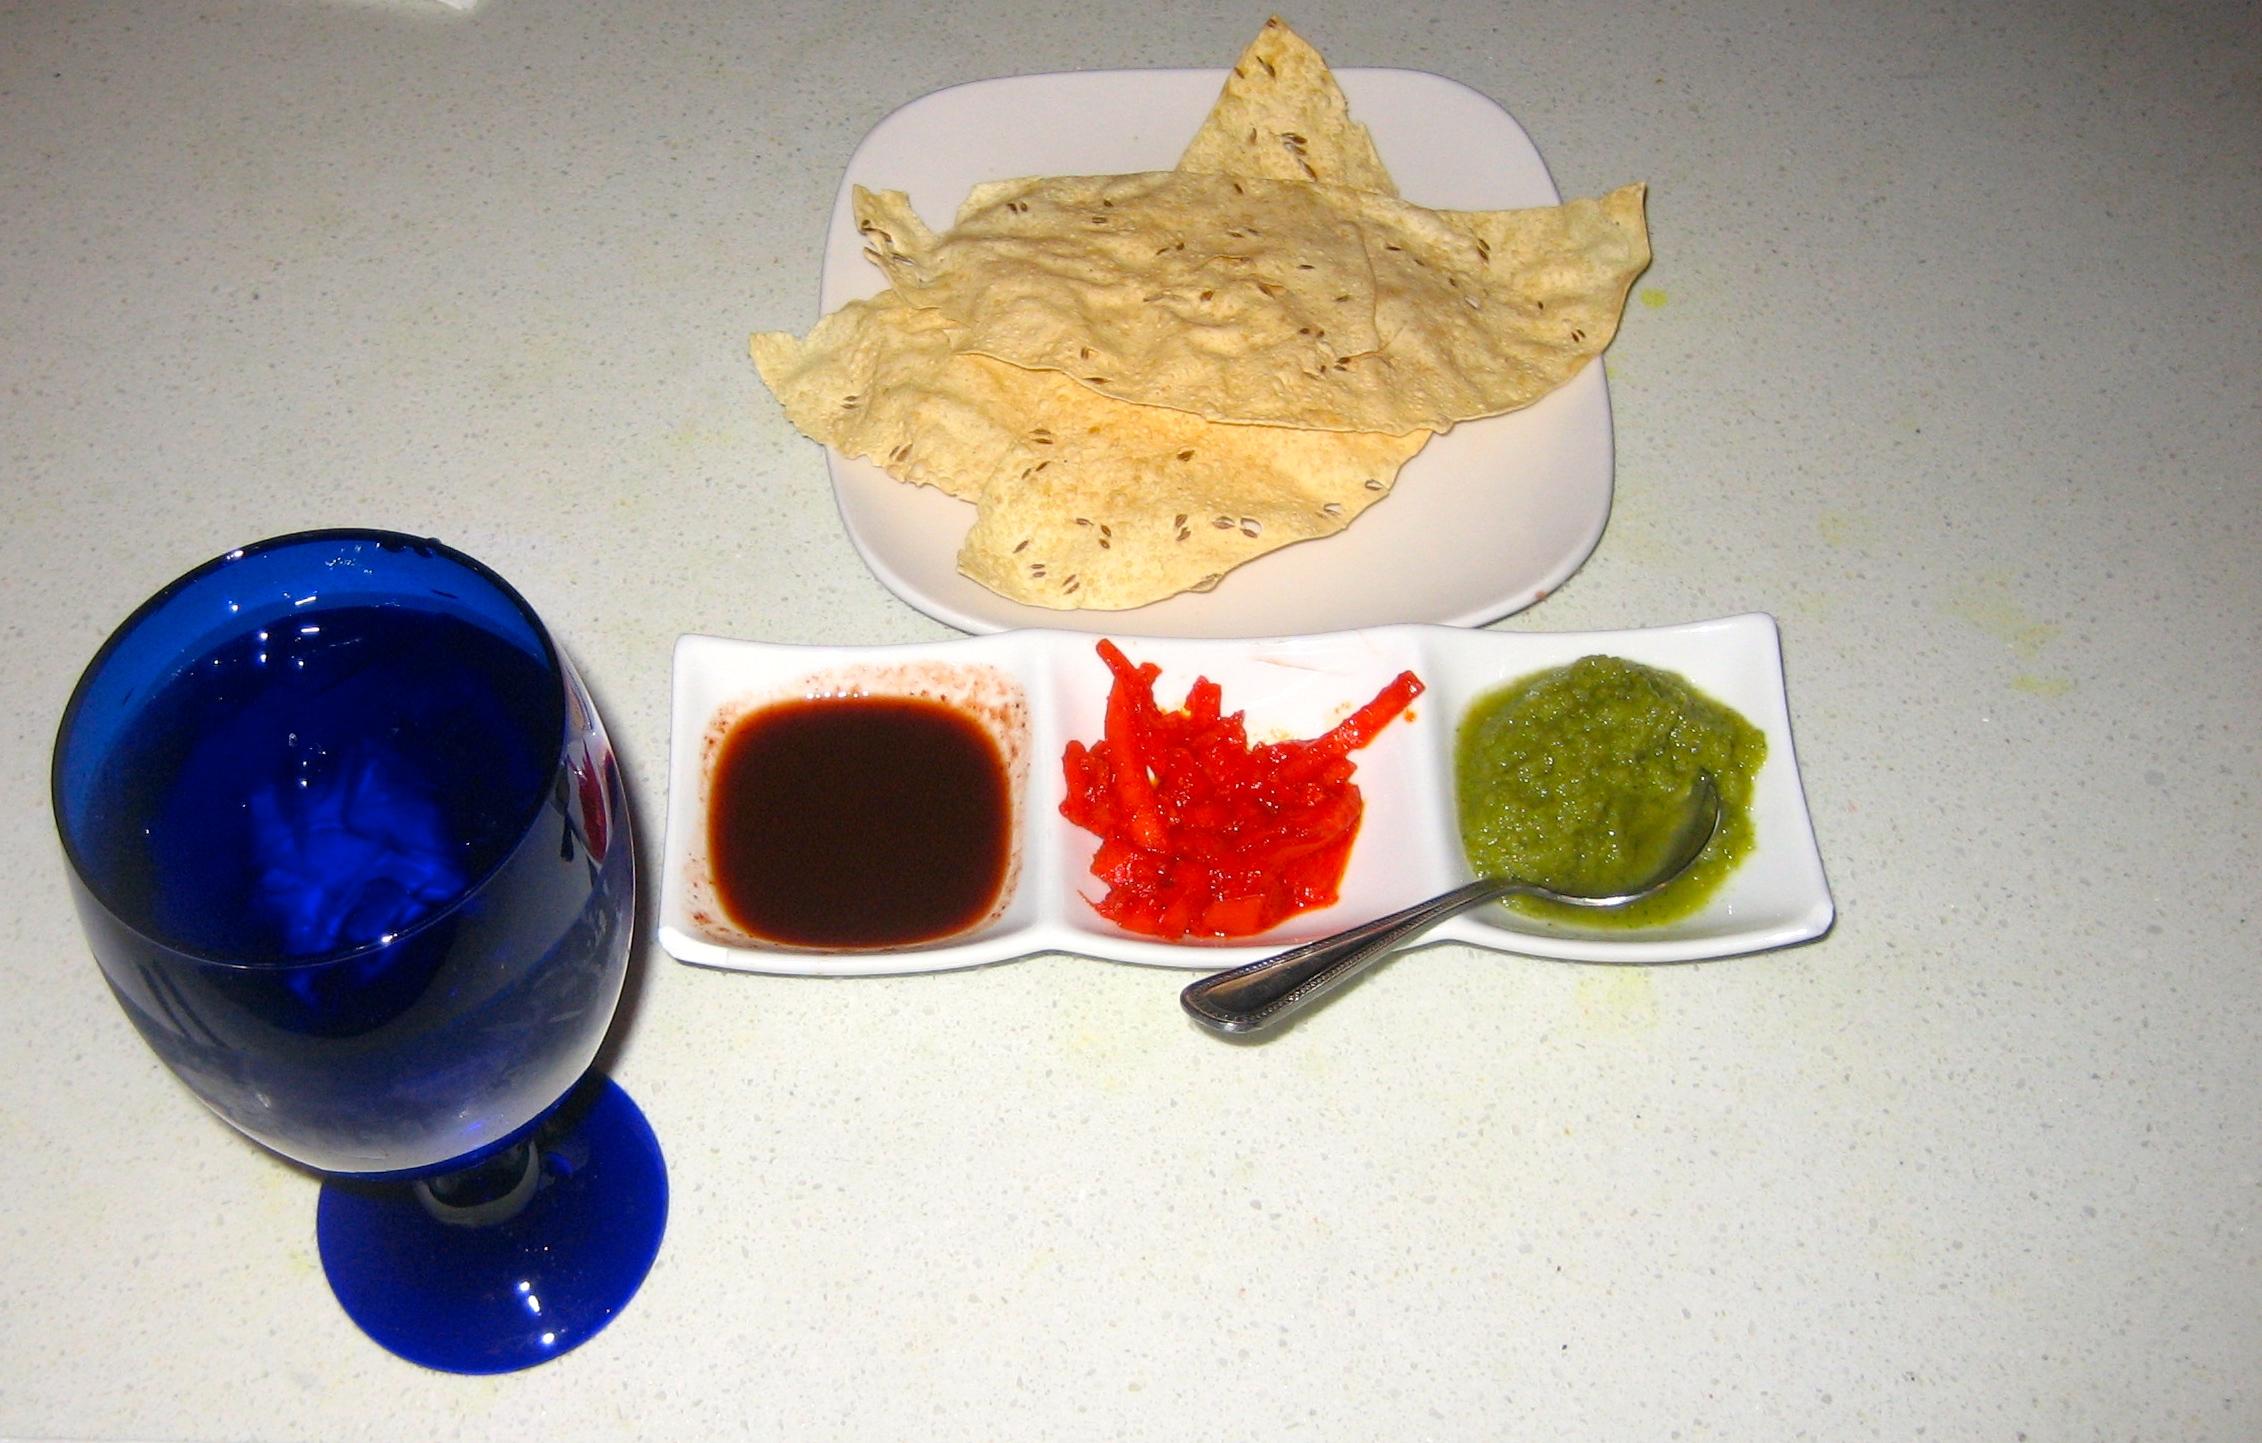 Taste of India's chutneys